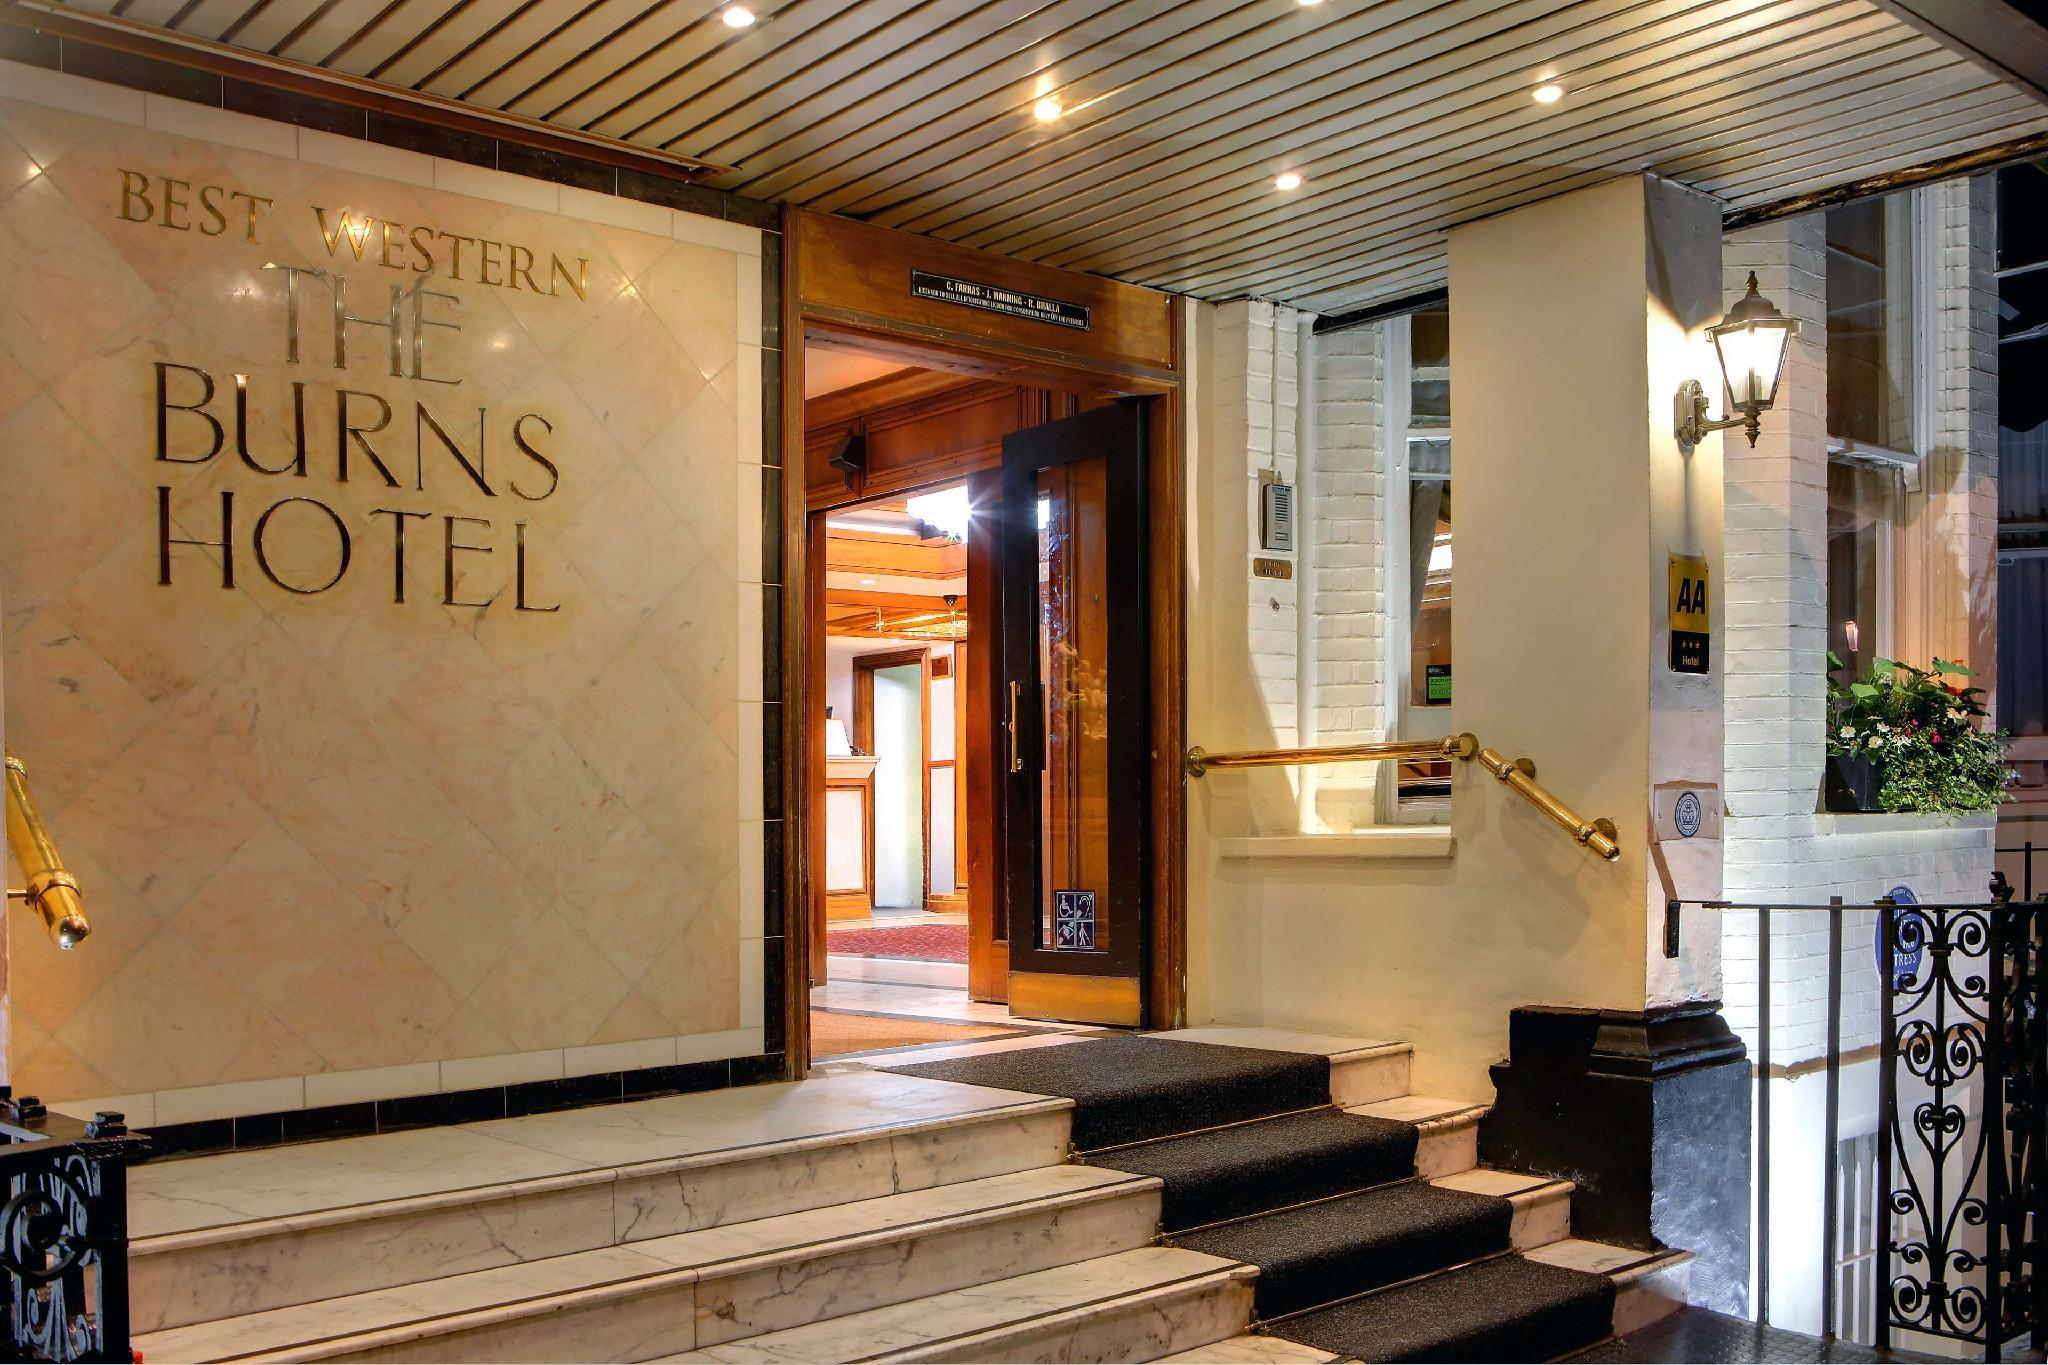 Best Western Burns Hotel London